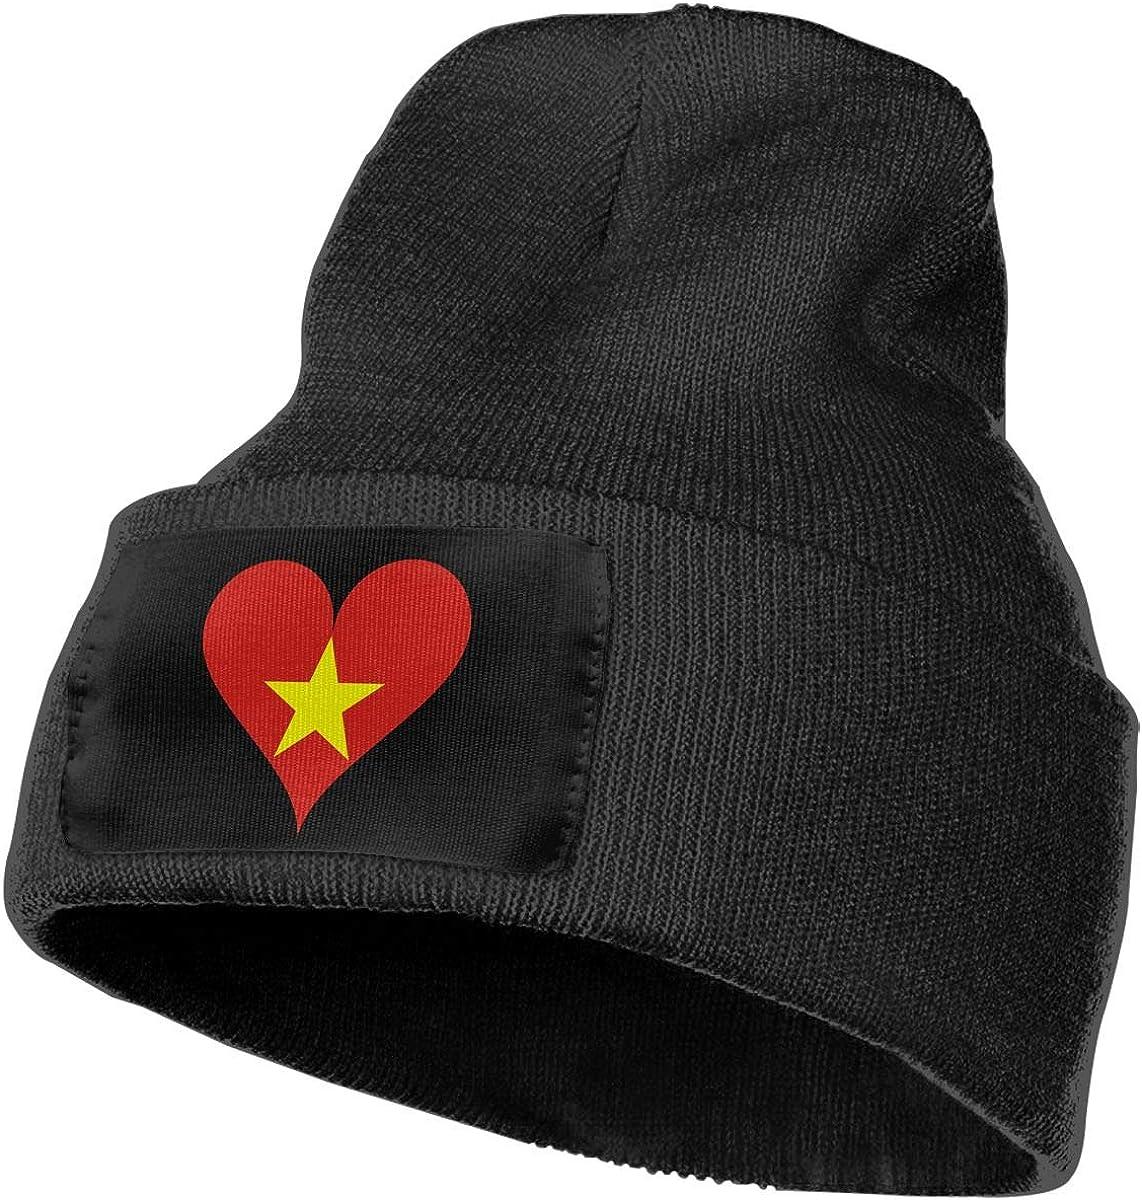 SLADDD1 Vietnam Heart Warm Winter Hat Knit Beanie Skull Cap Cuff Beanie Hat Winter Hats for Men /& Women